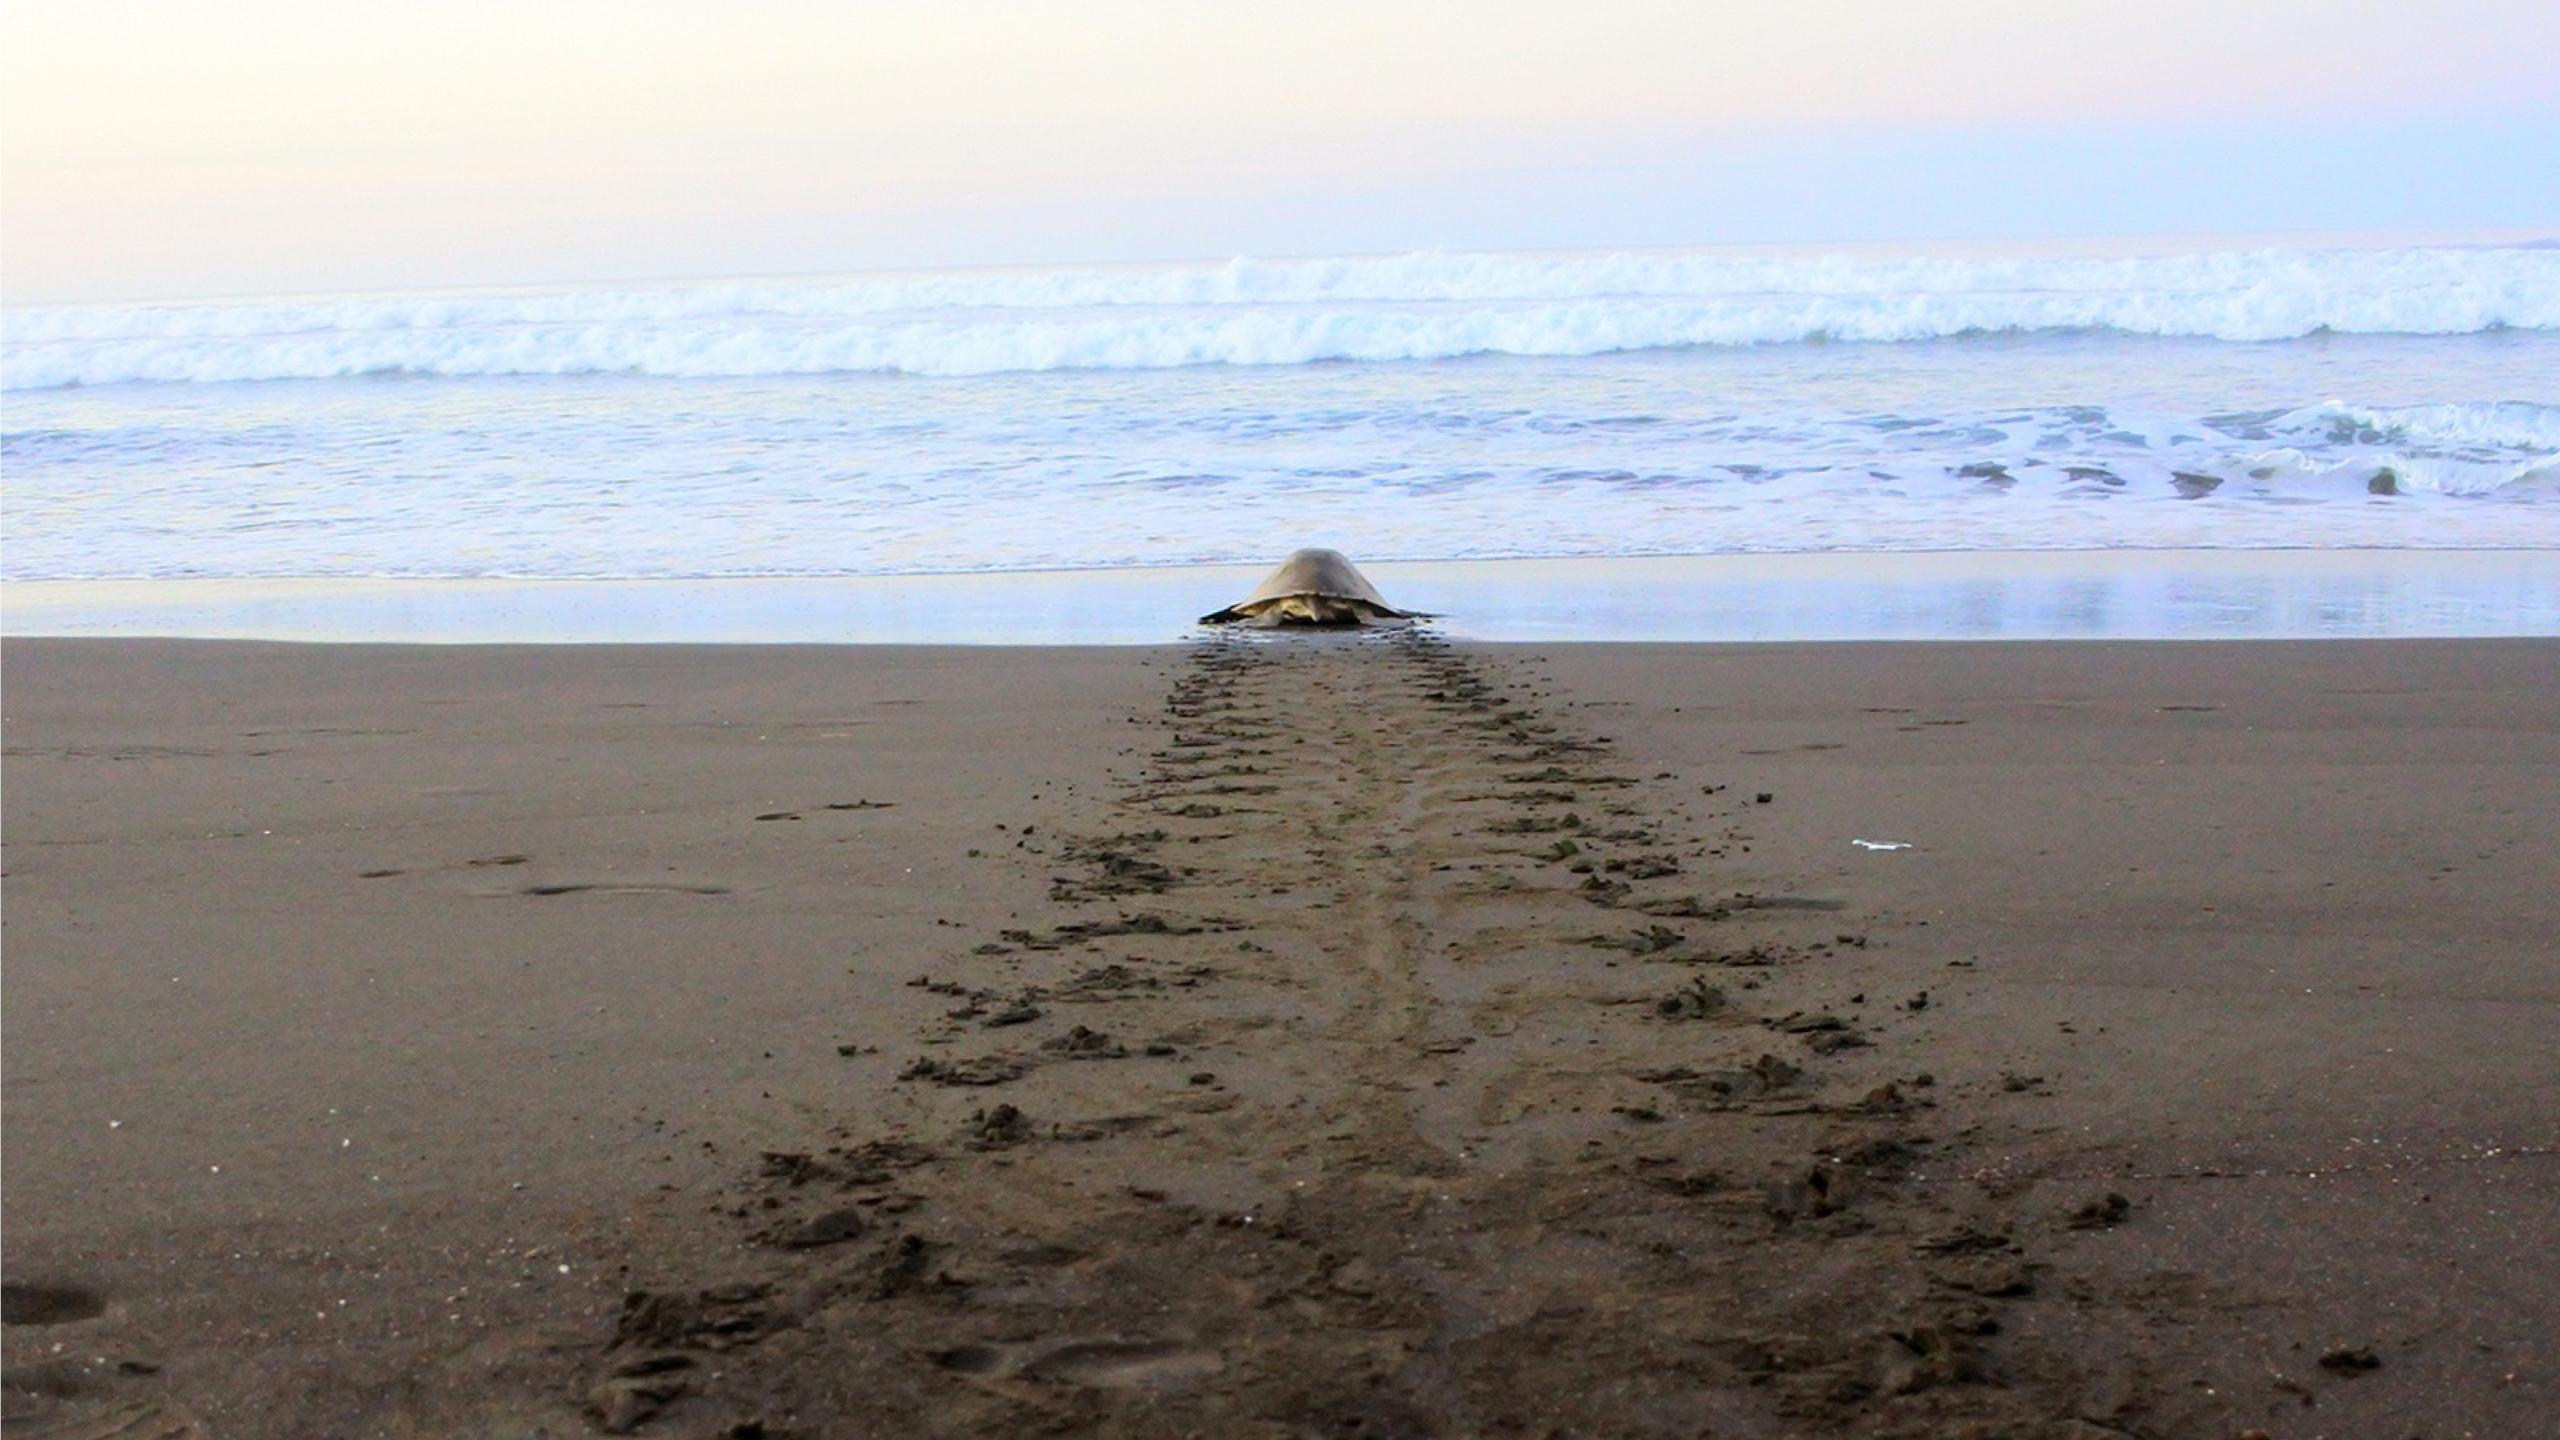 zeeschildpadden in costa rica arribada